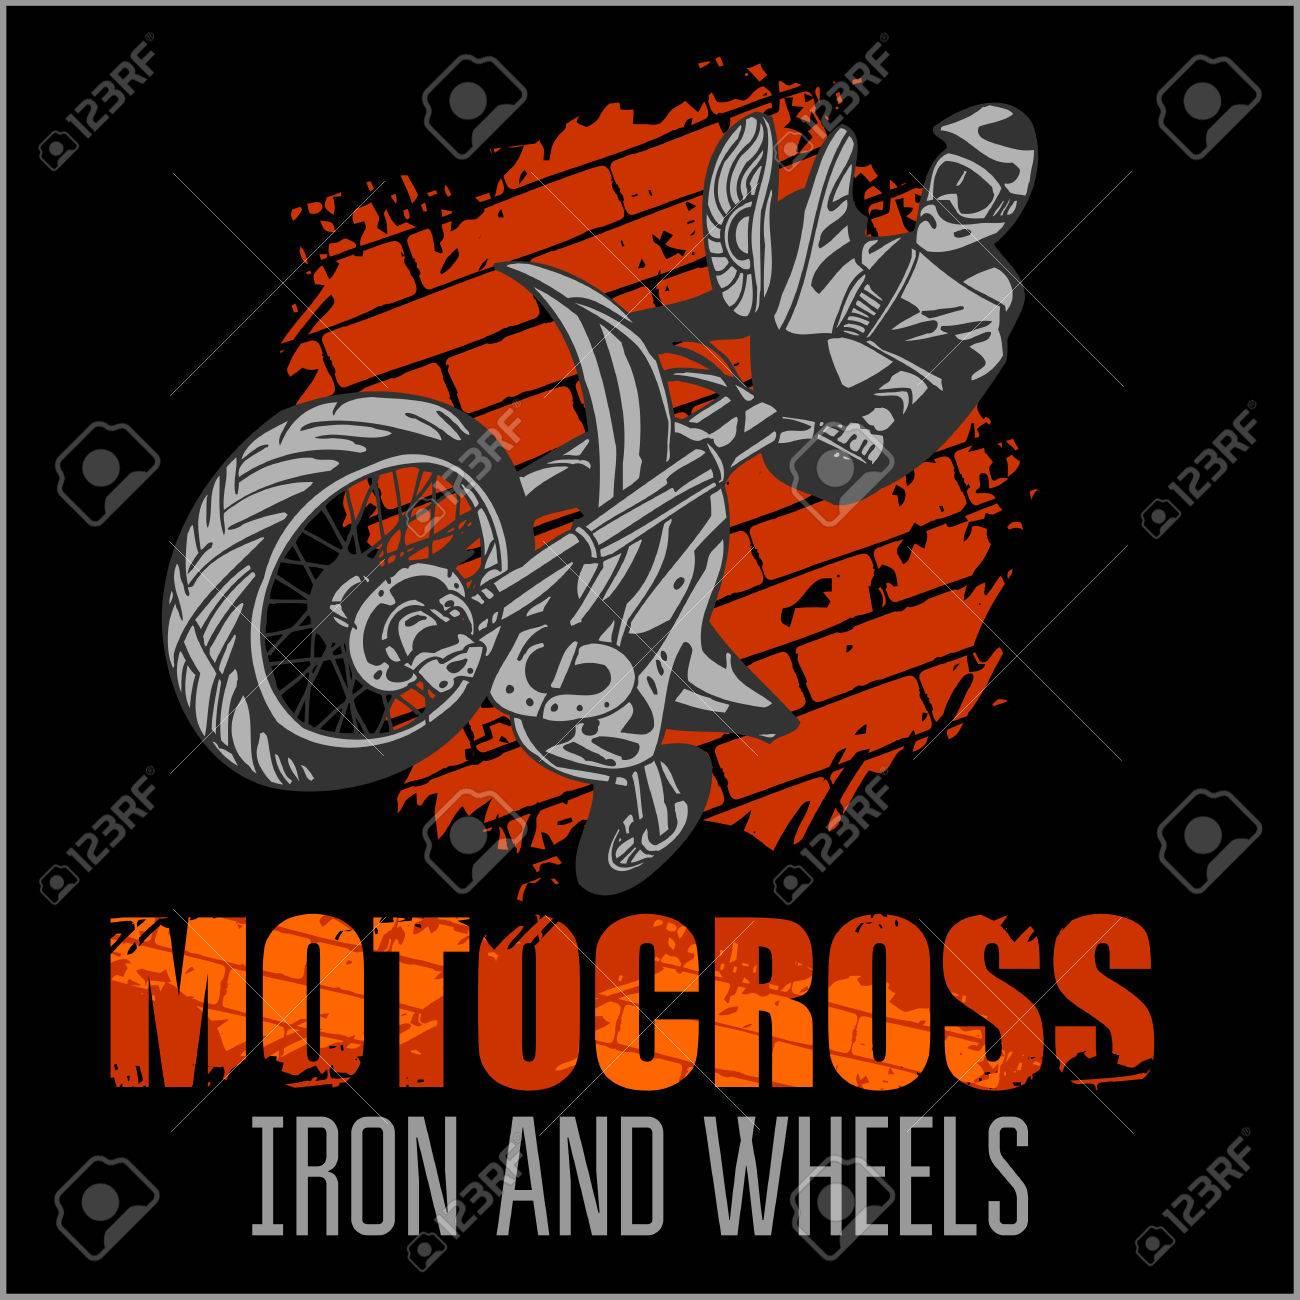 Design t shirt motocross - Motocross Sport Grunge Vector Emblem For T Shirts Stock Vector 38647004